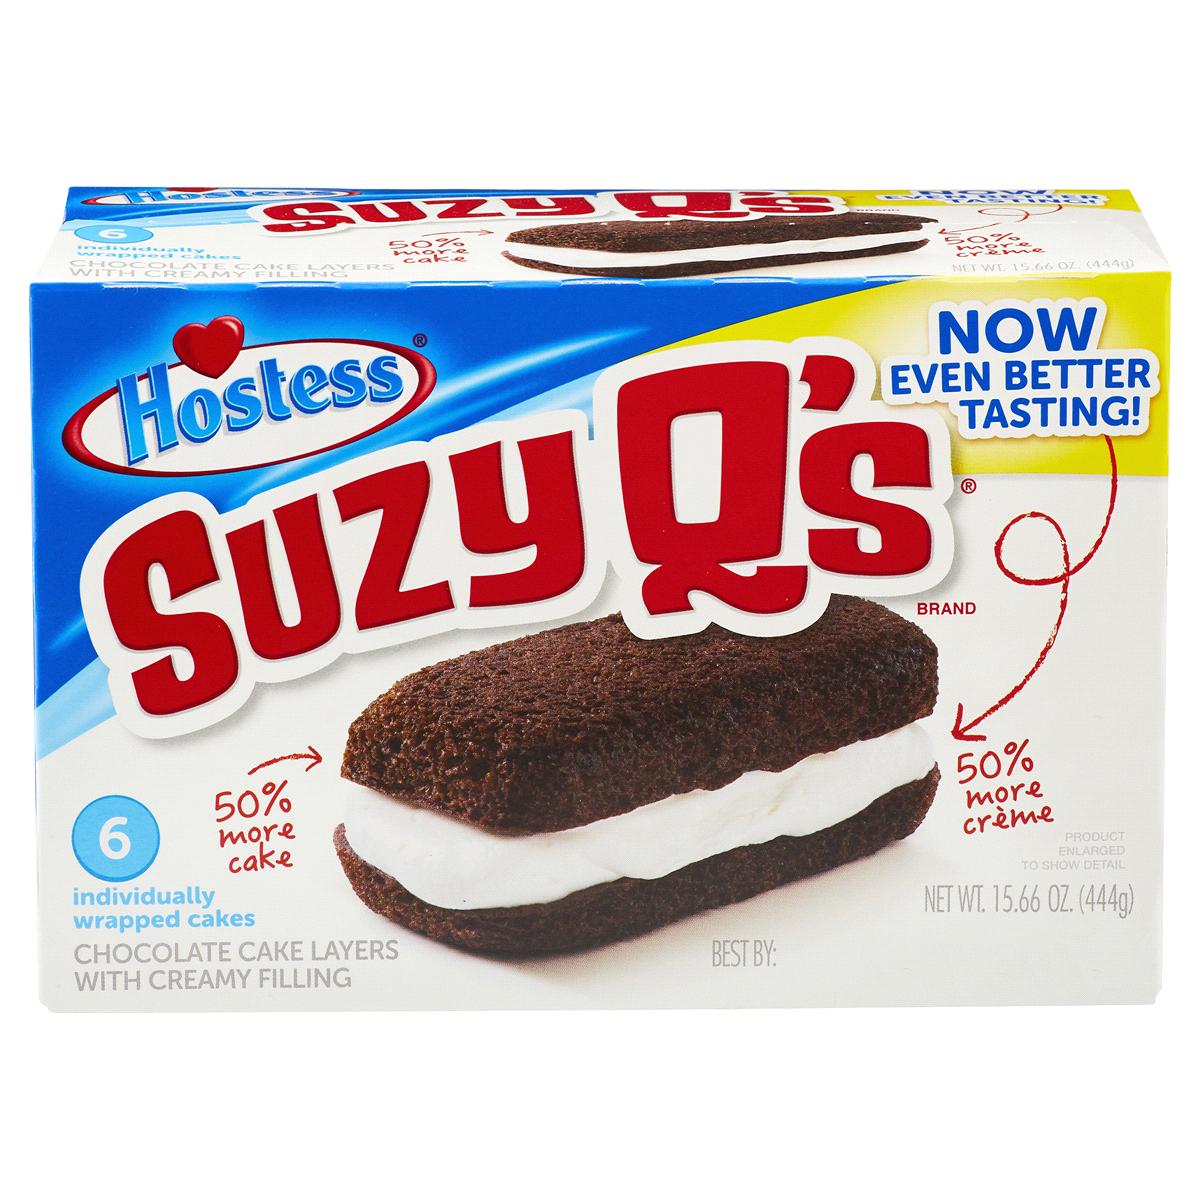 Hostess Suzy Q's (6 Pack) image